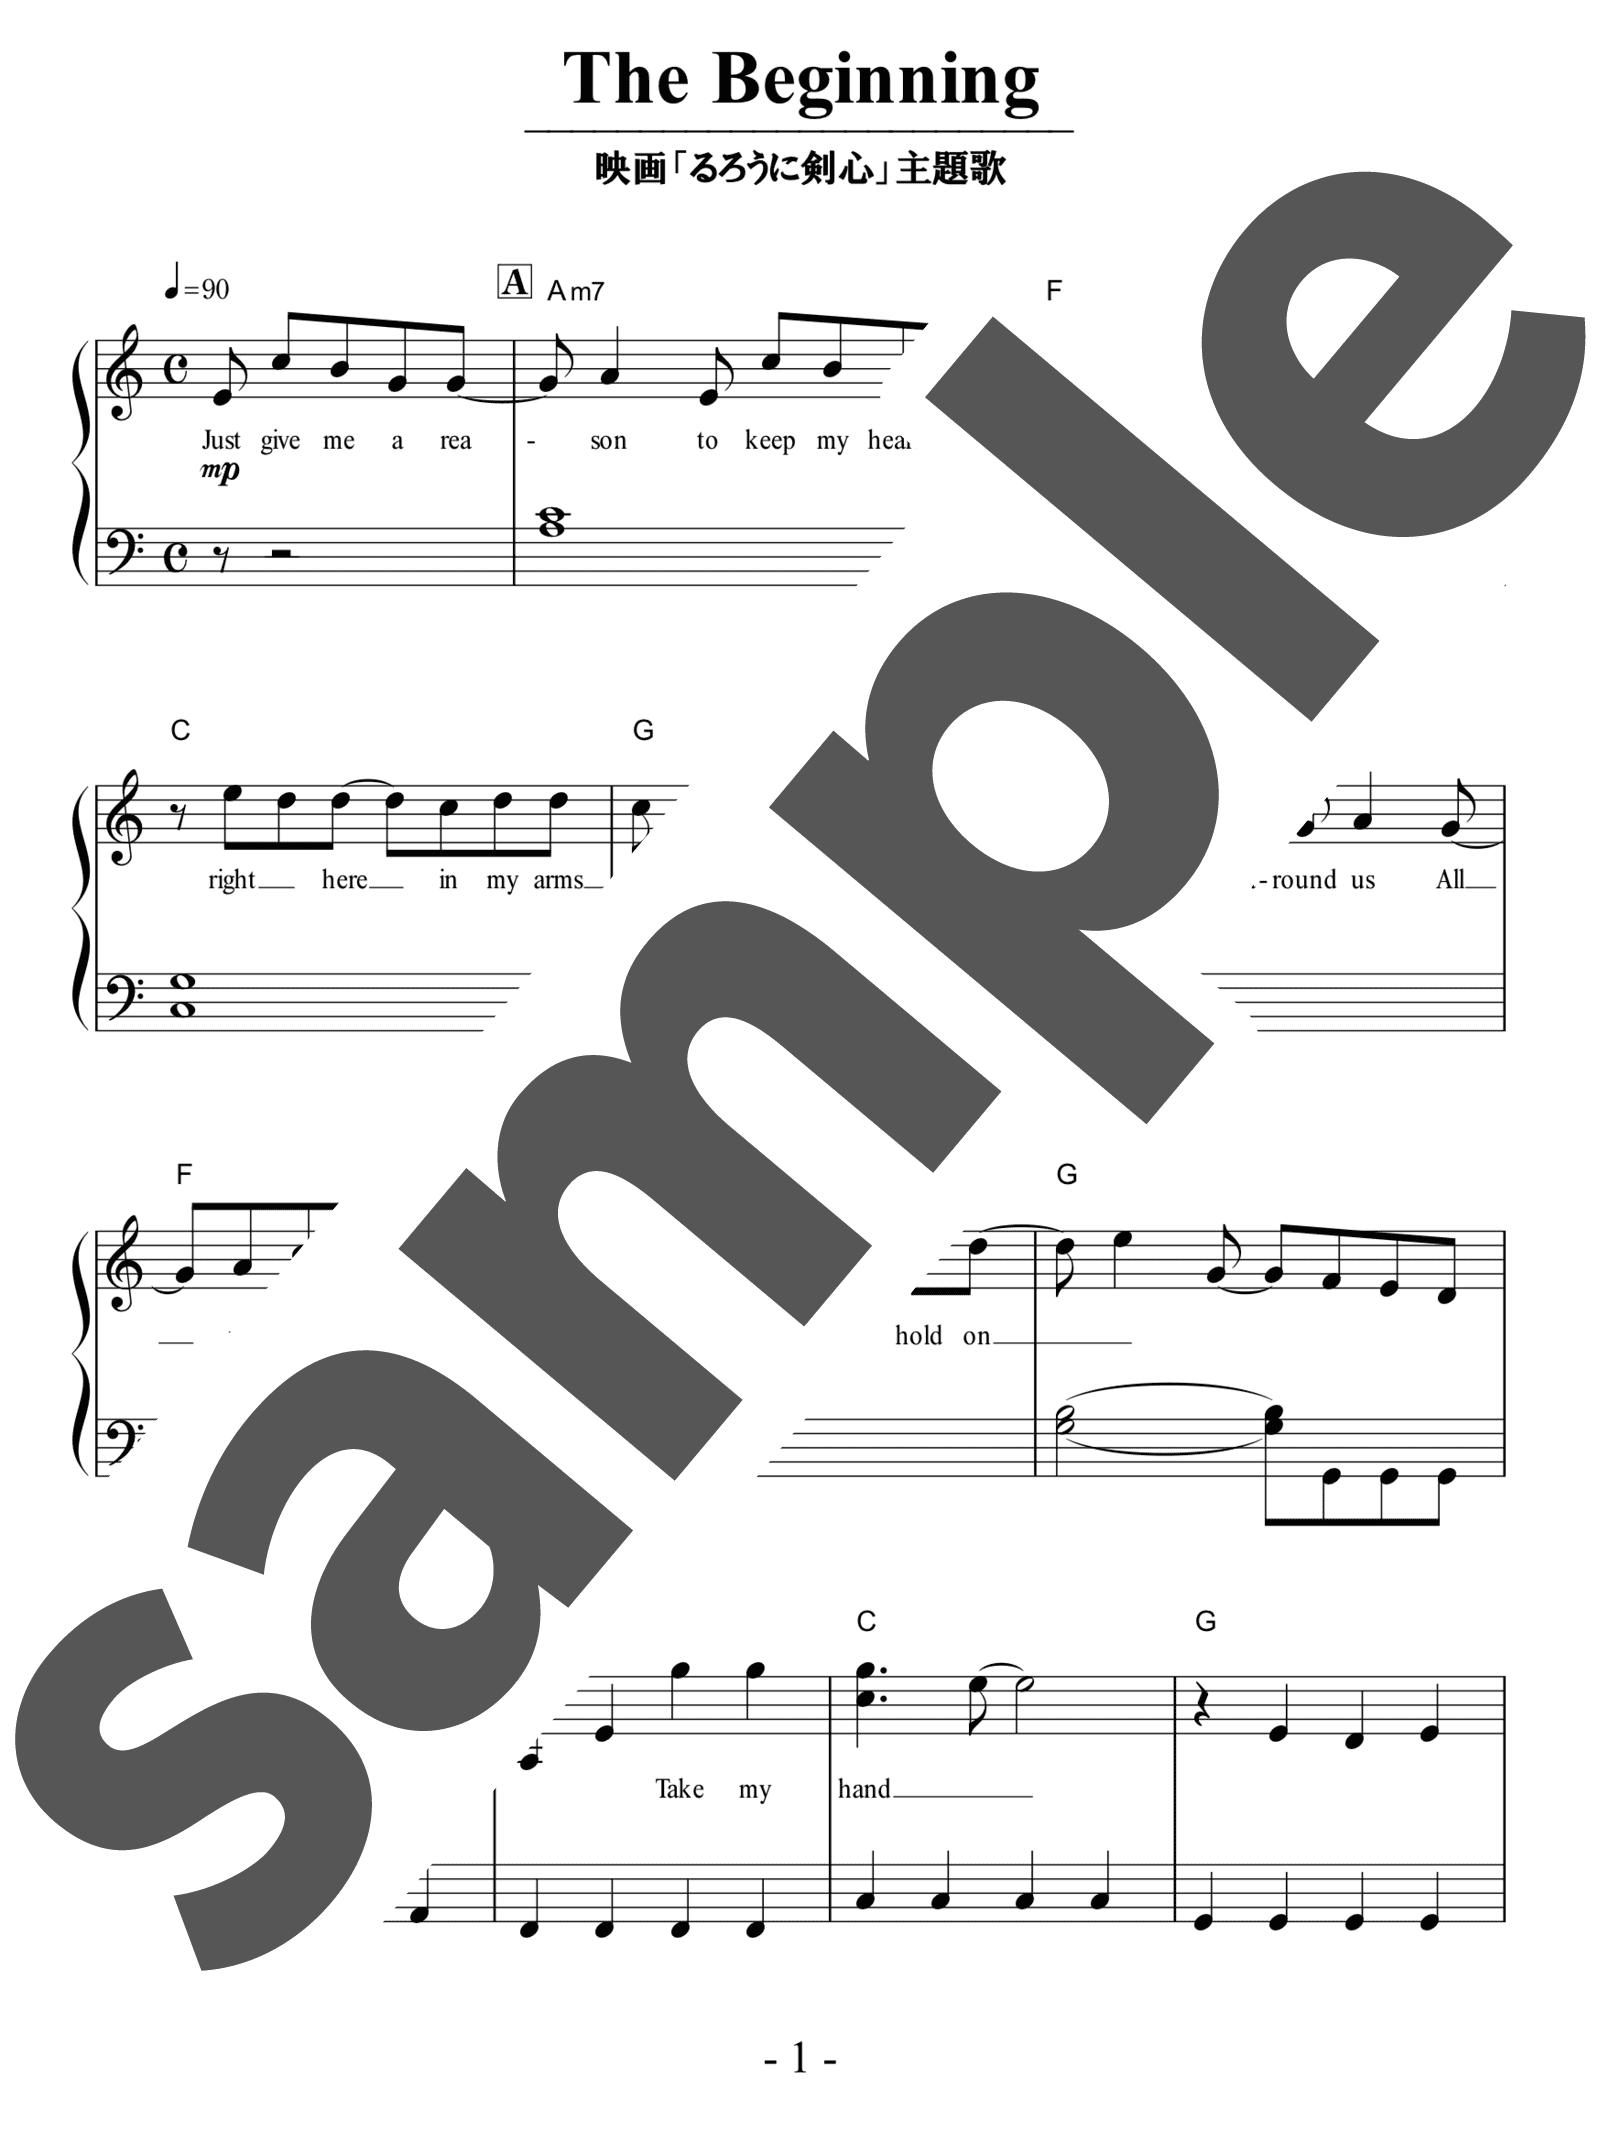 「The beginning」のサンプル楽譜